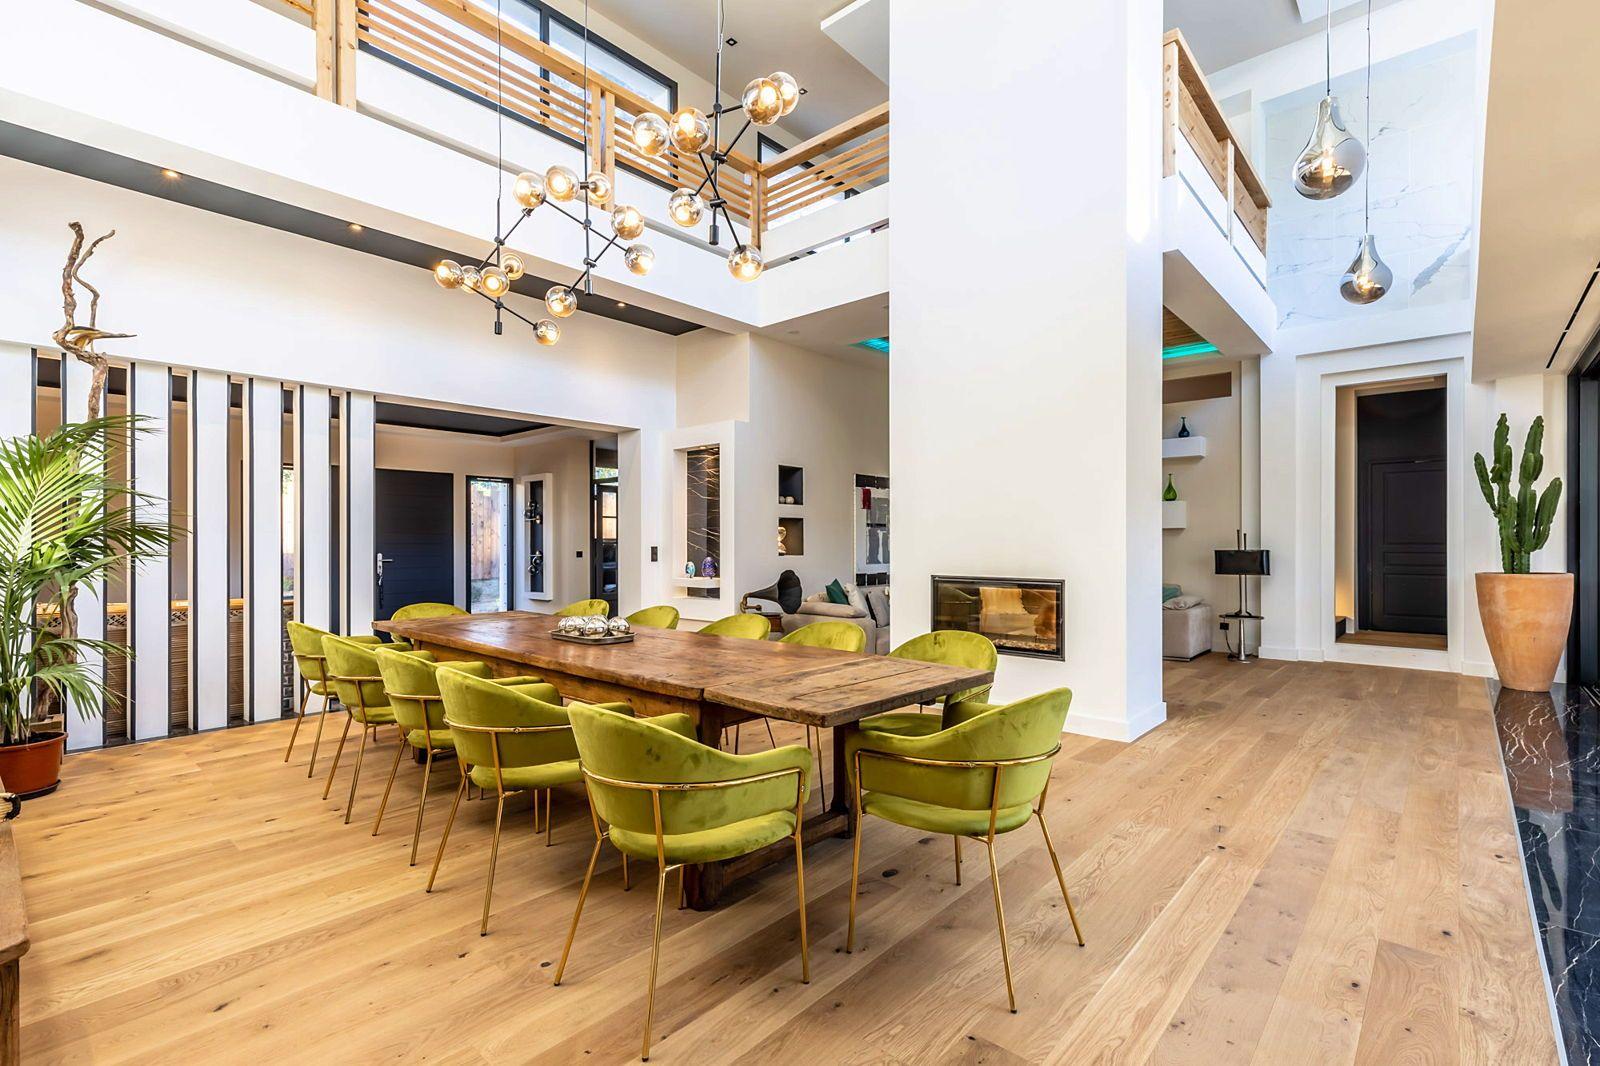 Vends villa 5suites 700m² à Anglet quartier Chiberta - Anglet (64600)